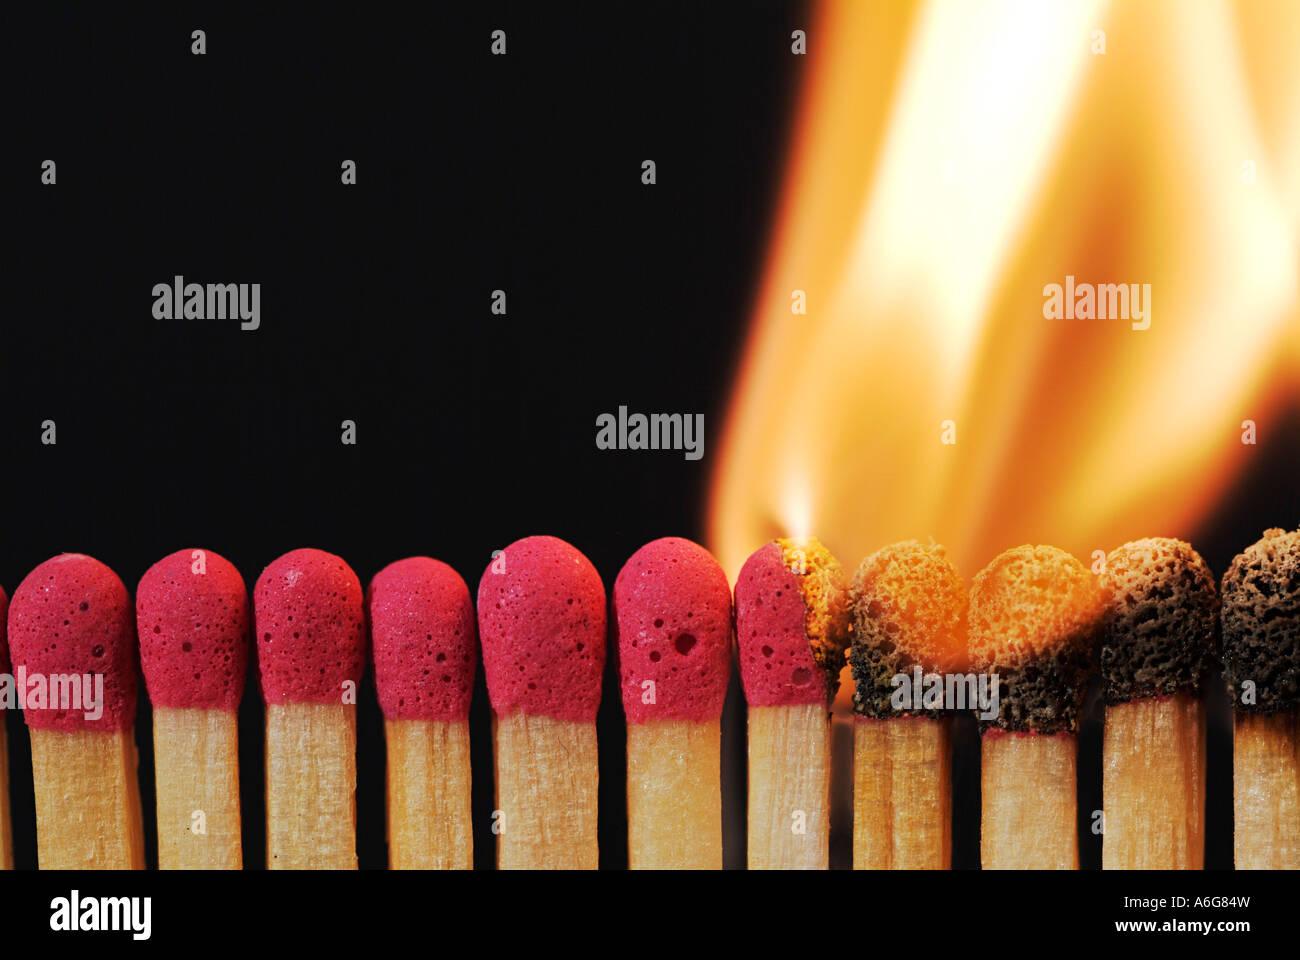 Lit Matches - Stock Image